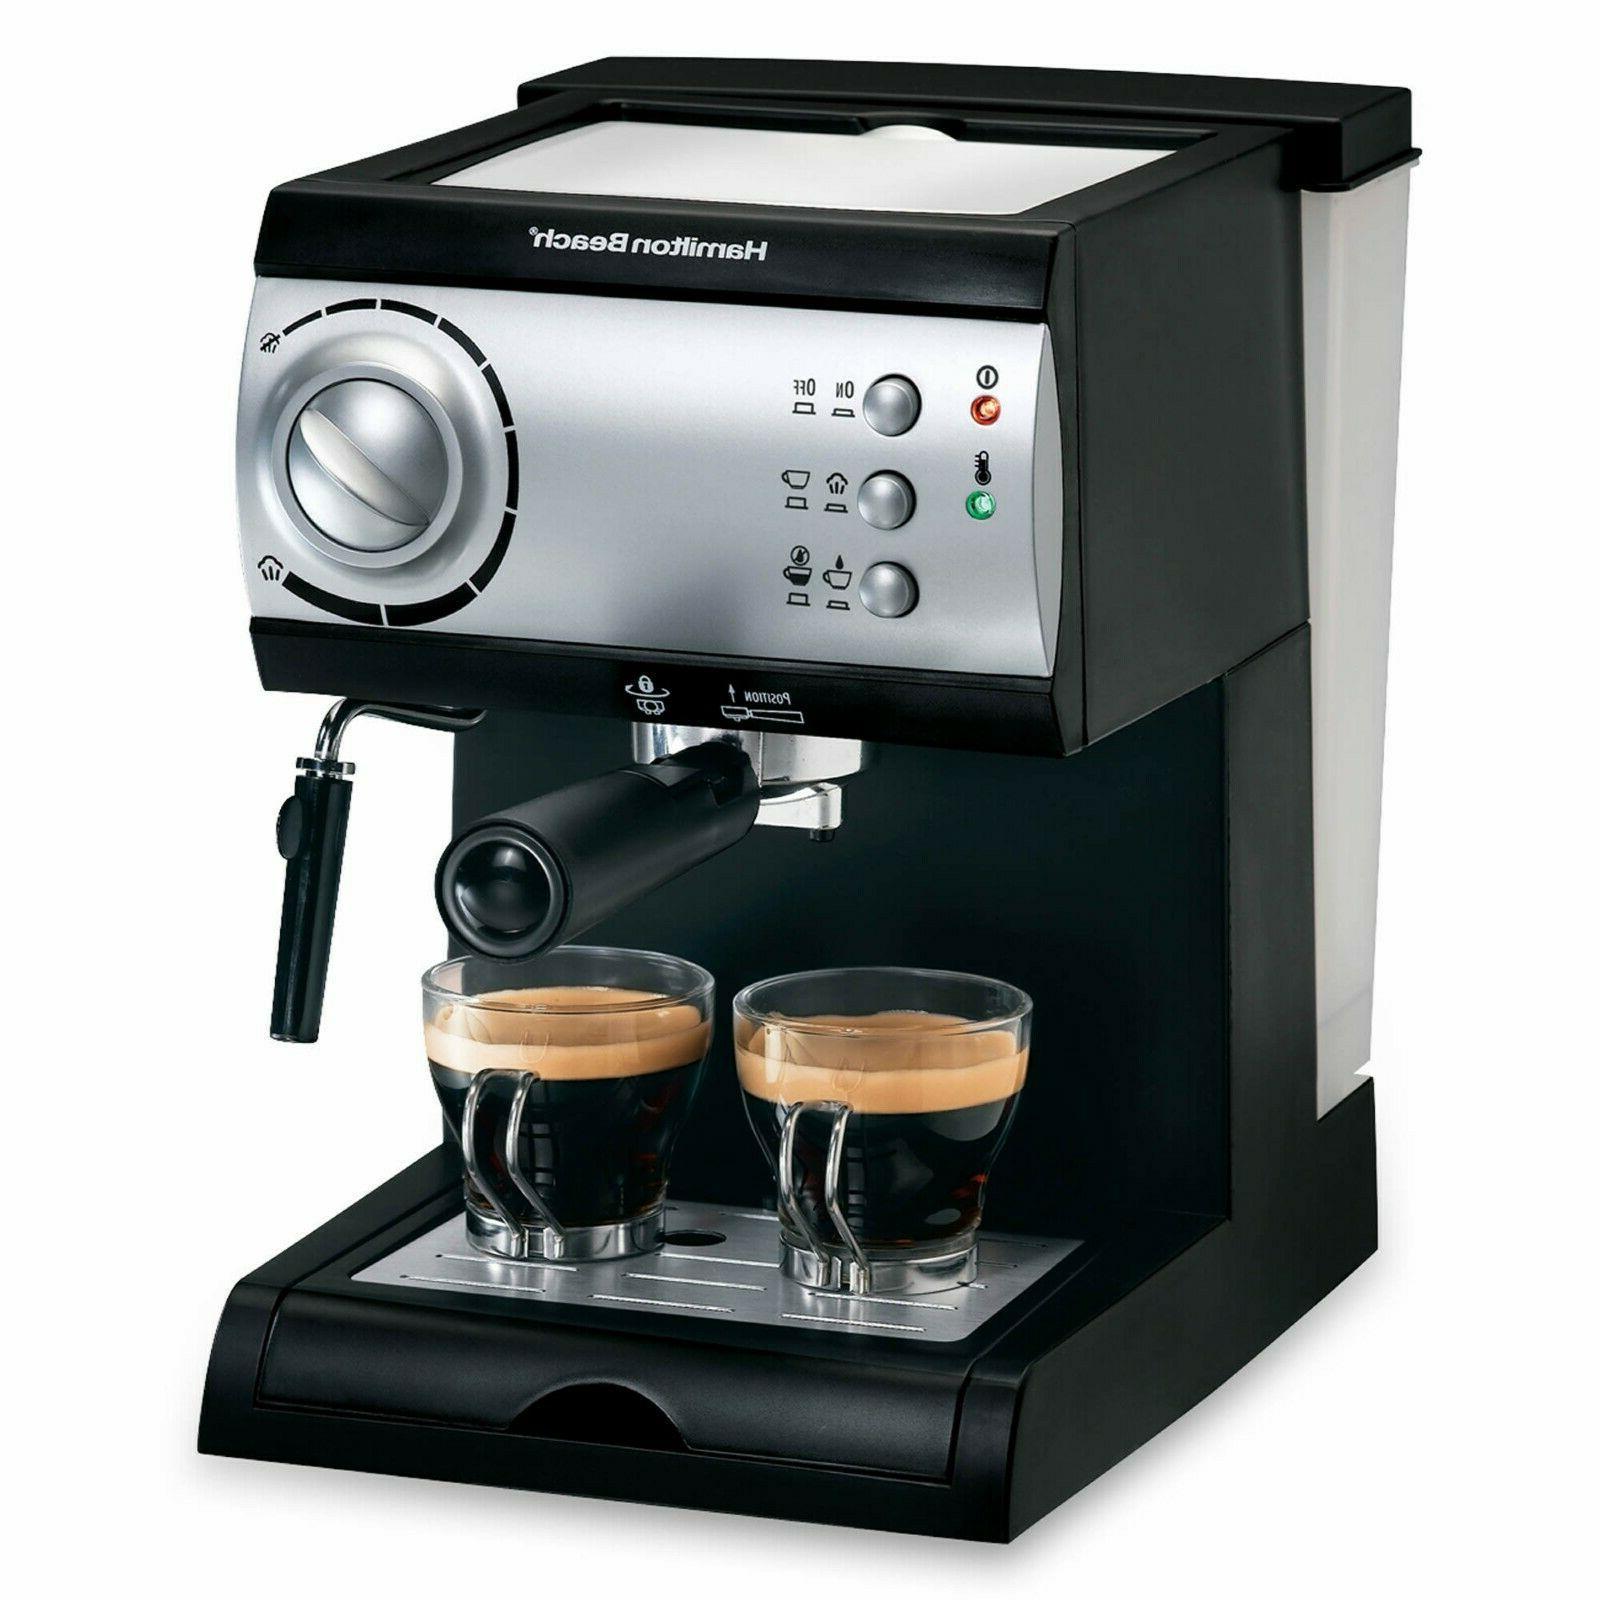 espresso maker with 15 bar italian pump